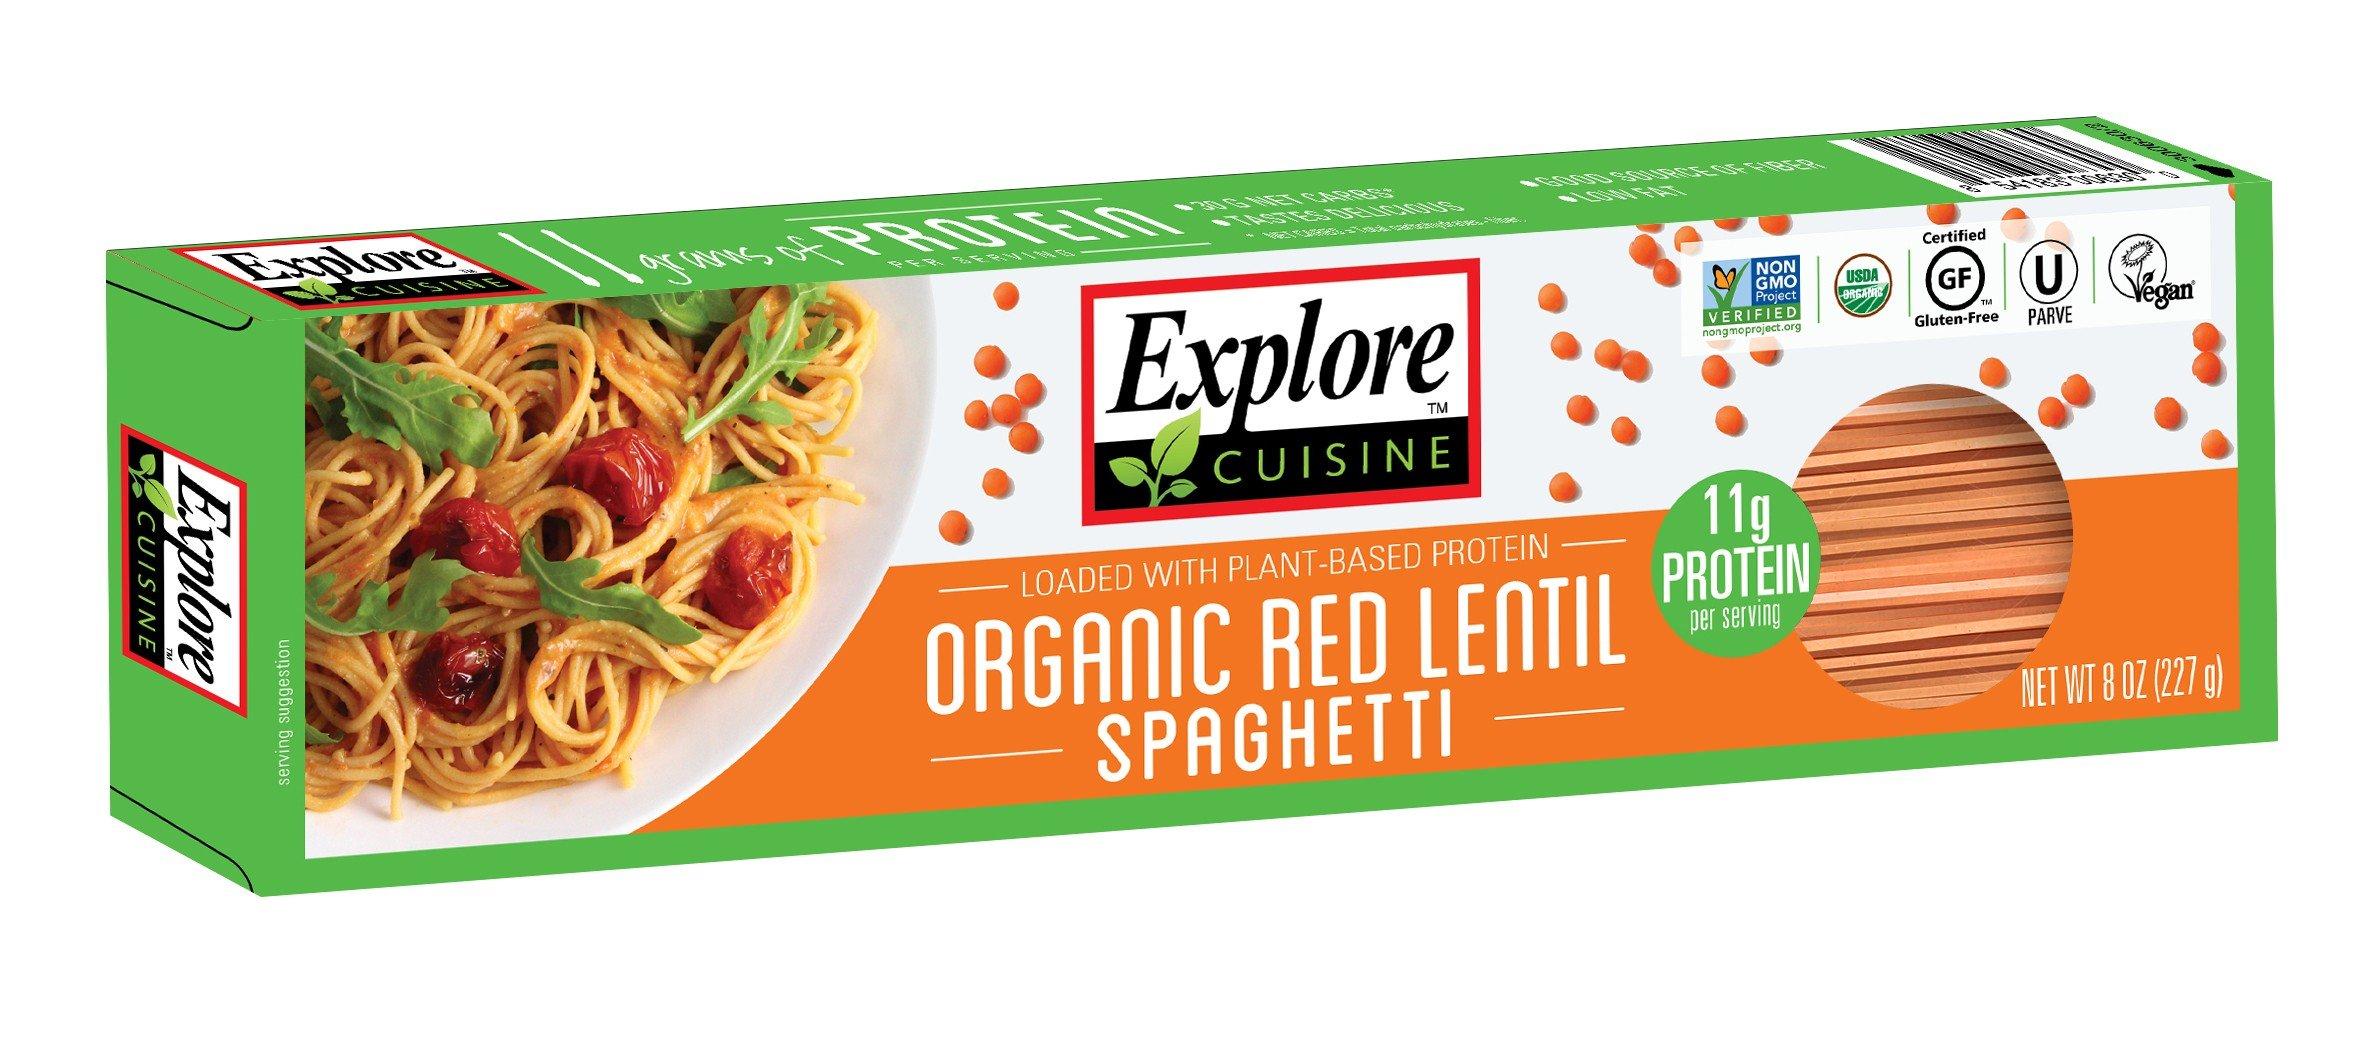 Explore Cuisine Organic Red Lentil Spaghetti, Gluten Free, Vegan, non-GMO, 8 oz (Pack of 12)